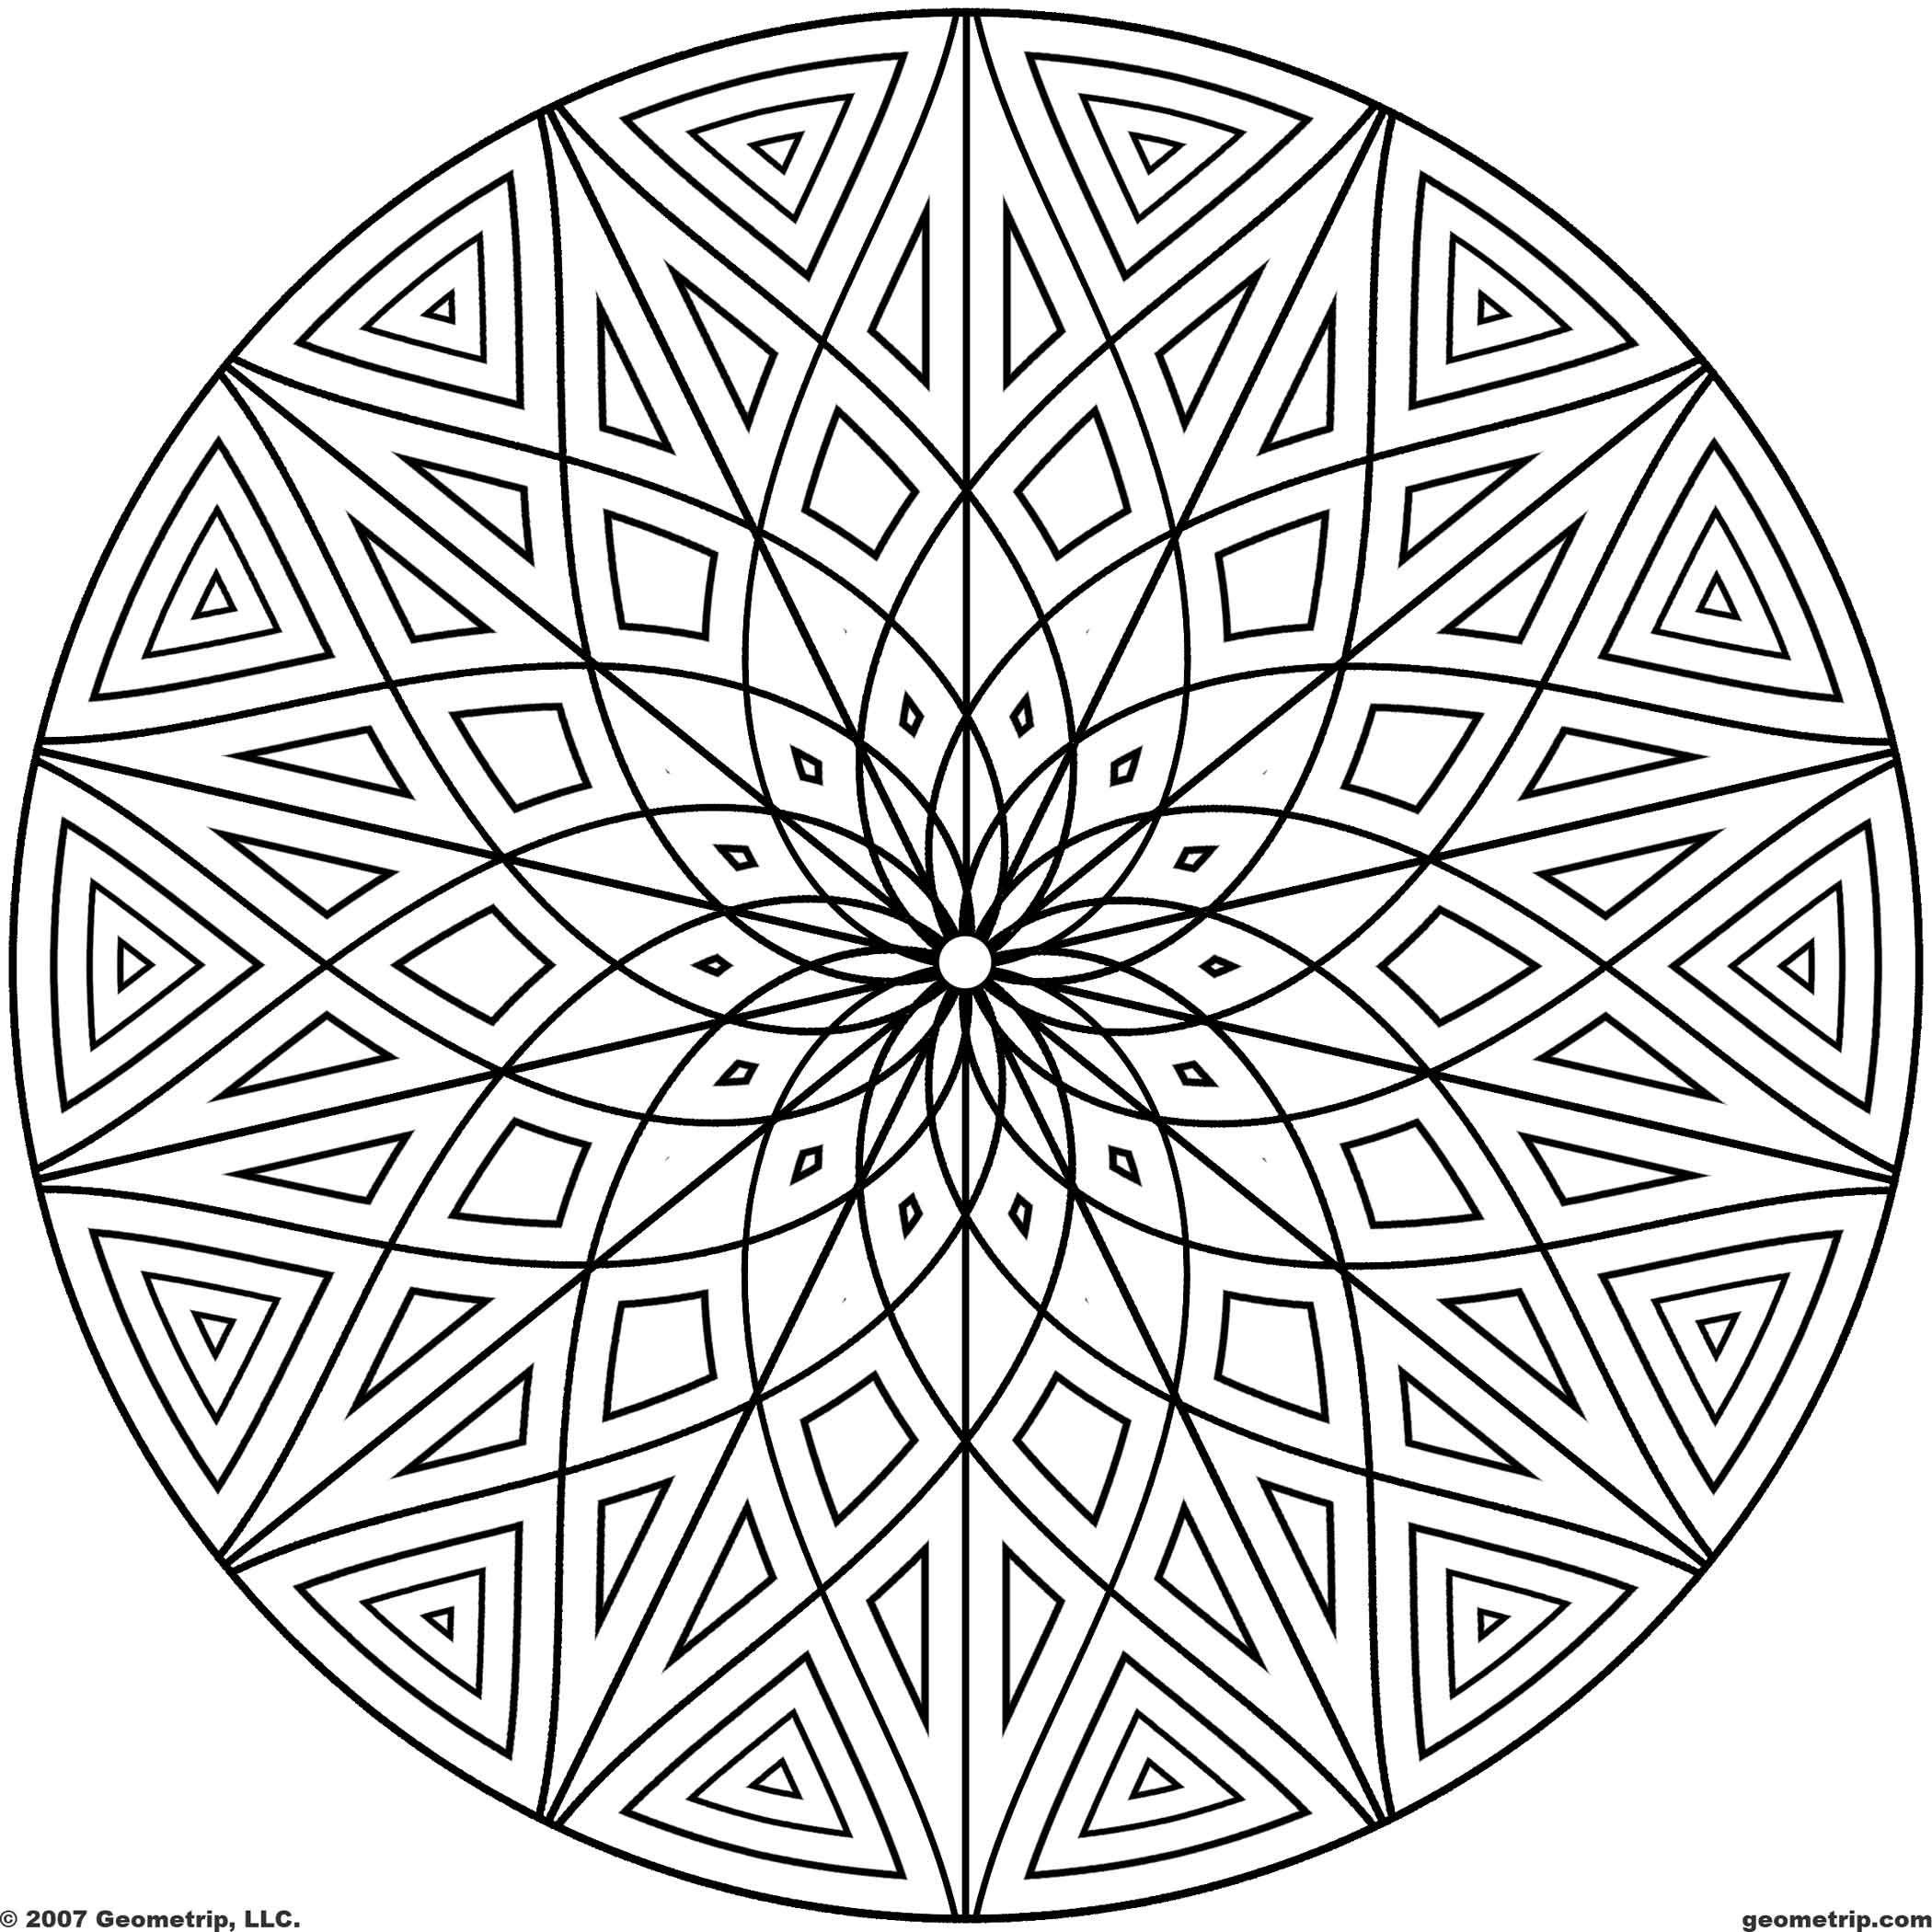 http://geometrip.com/images/designs/circles/set1/jpg-large/geometrip ...